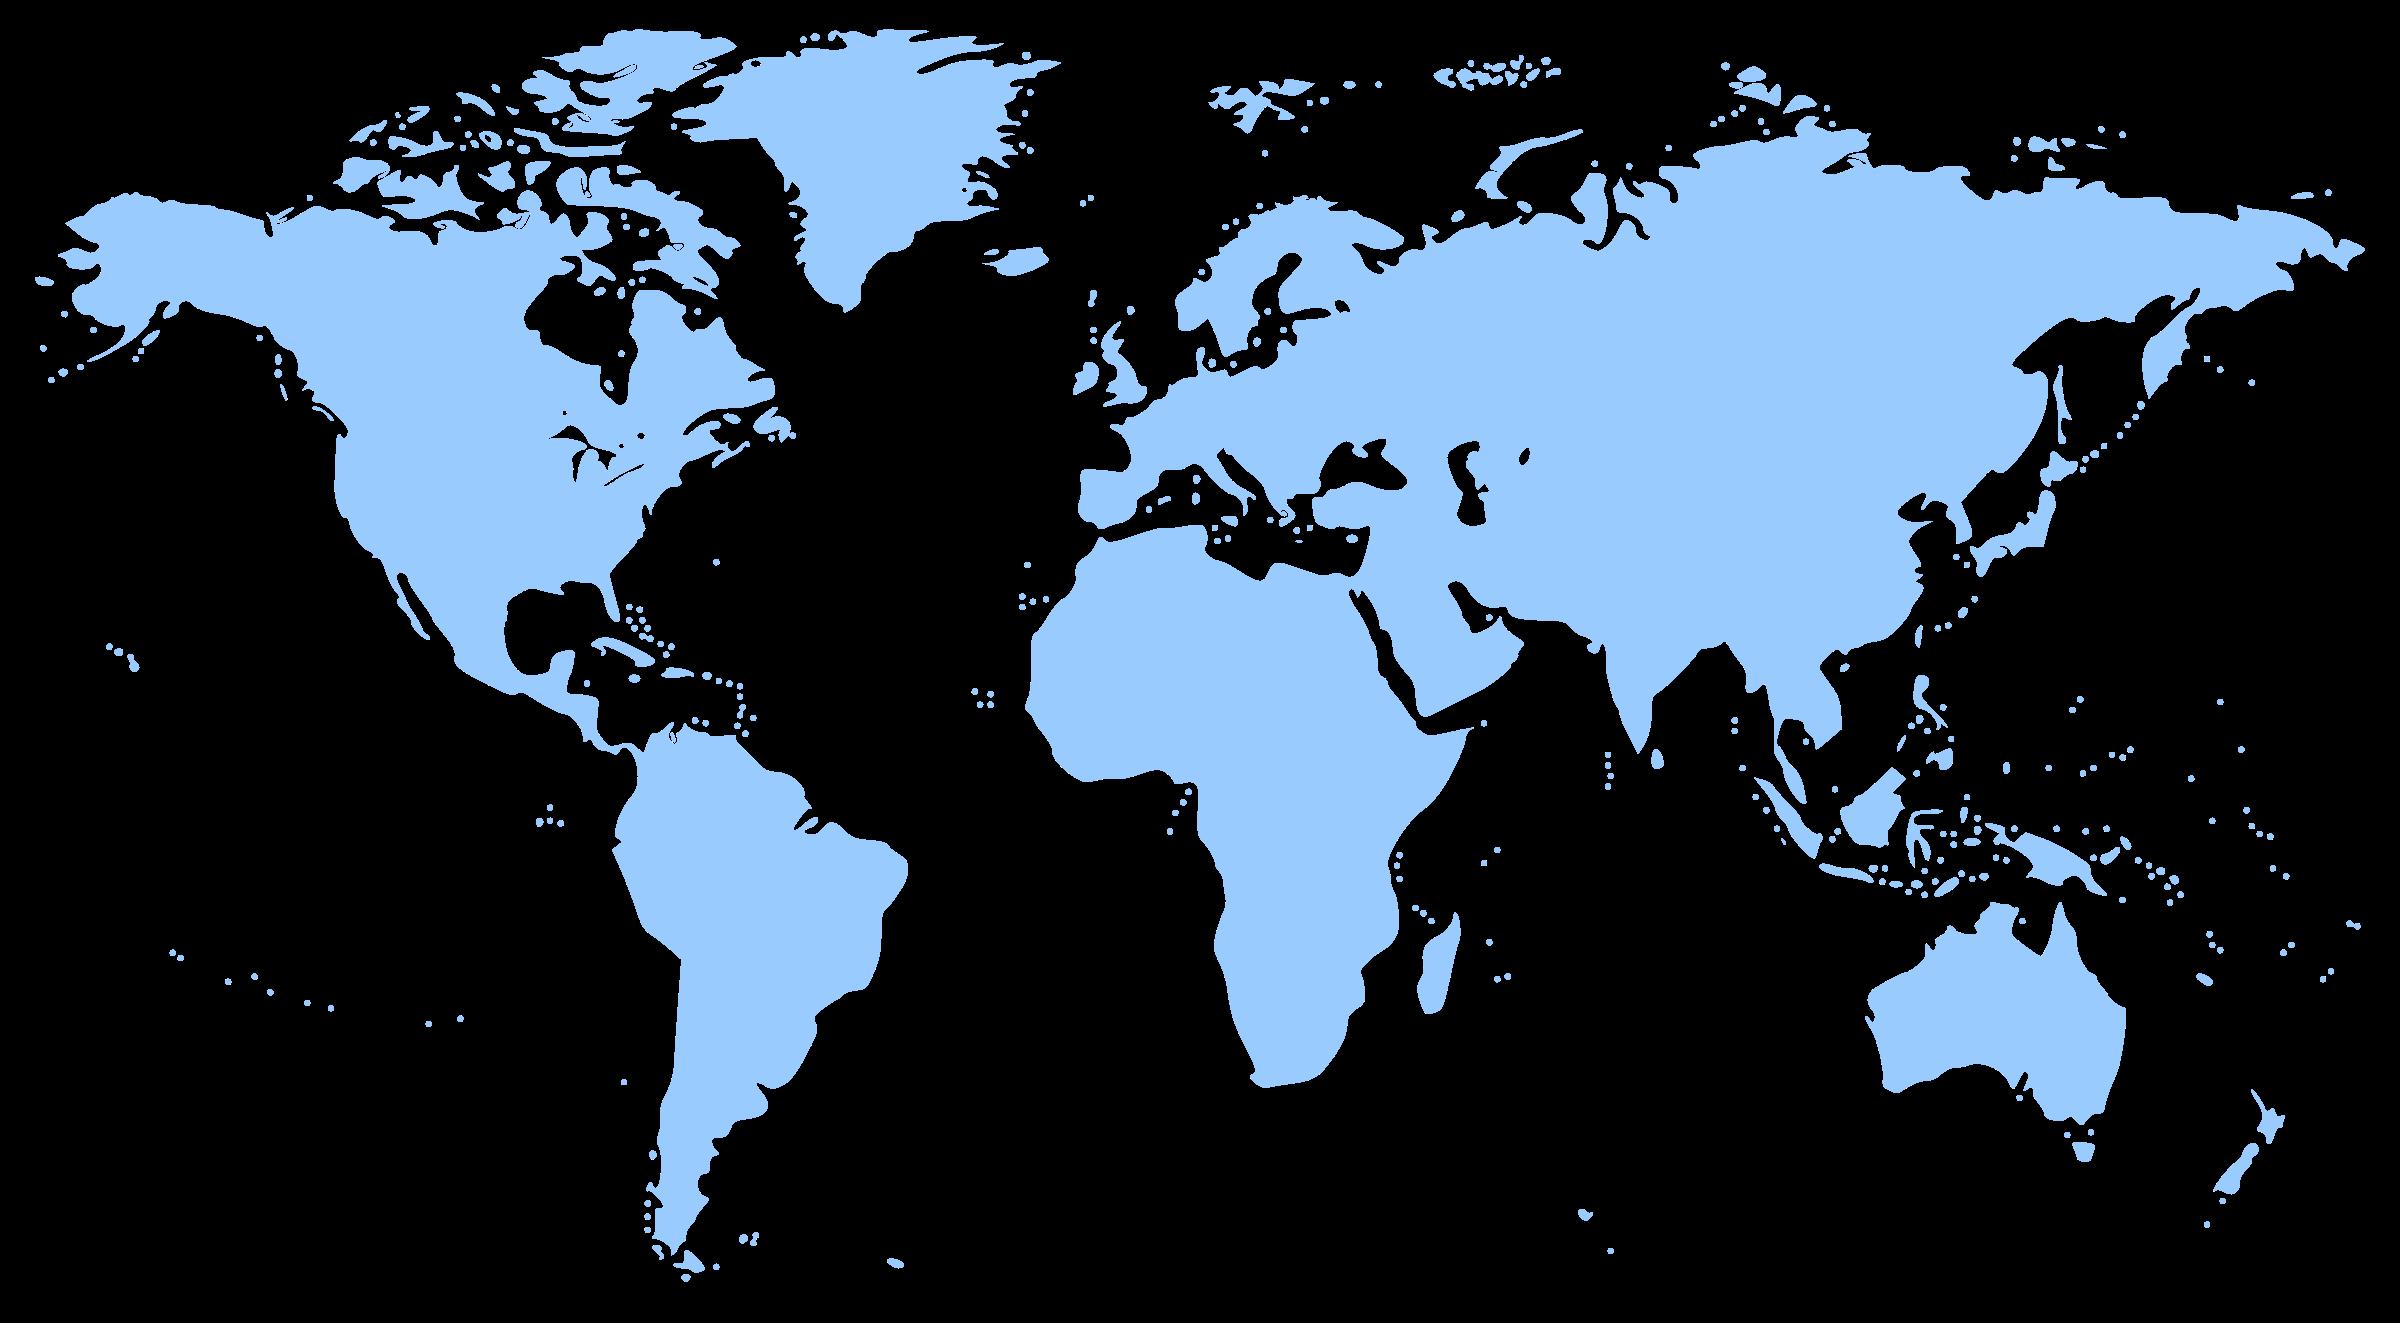 Clipart World Map